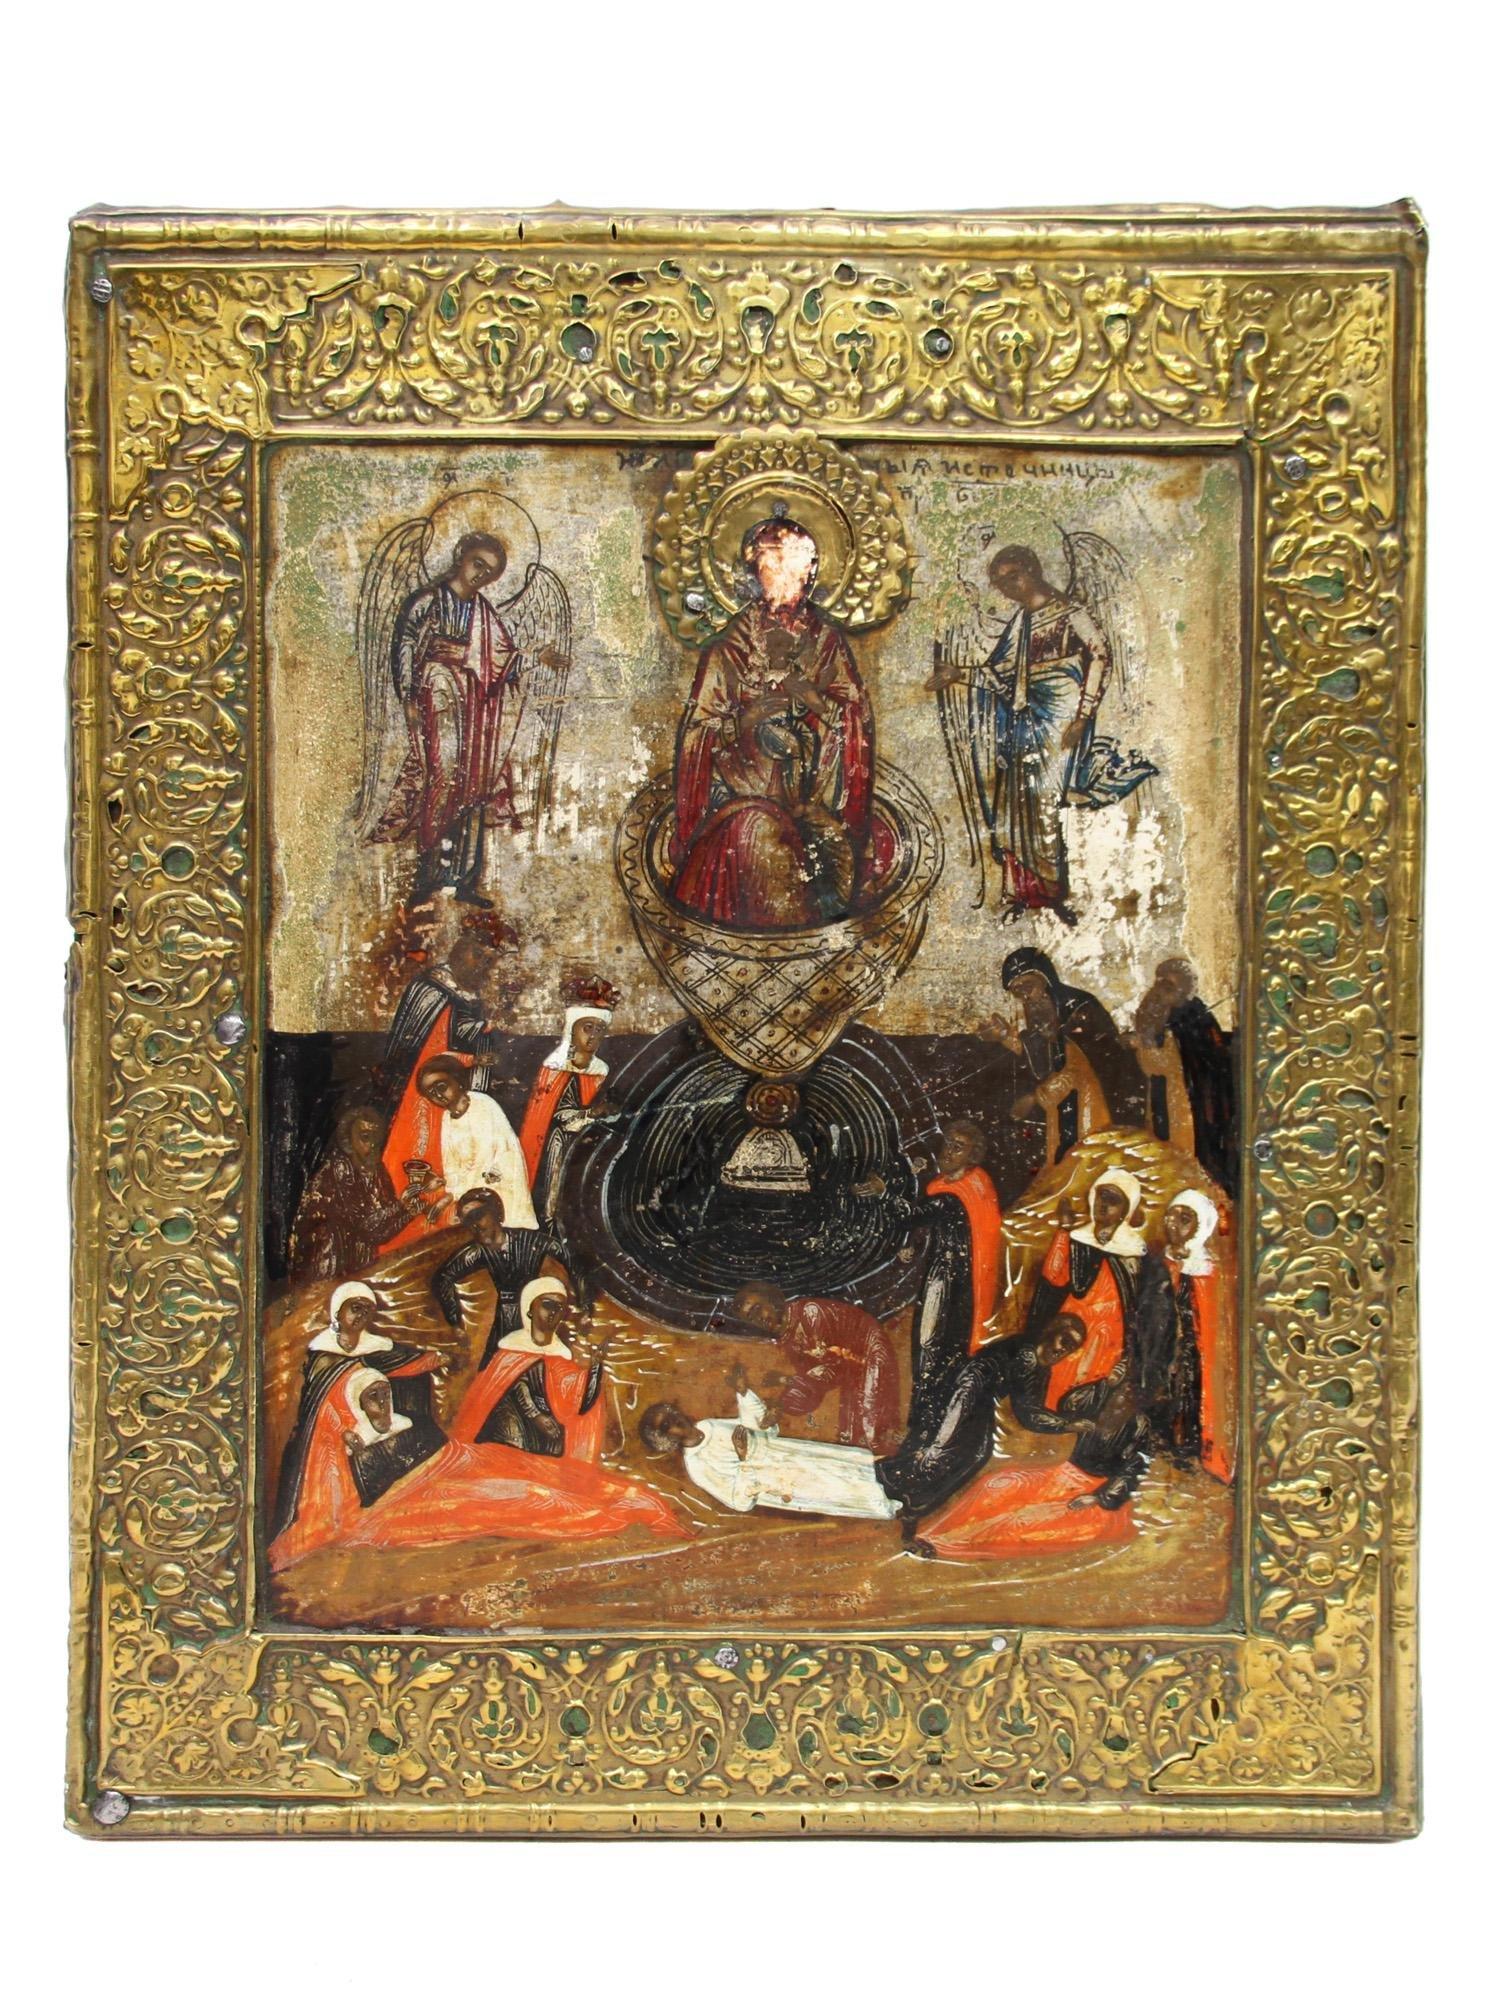 ICON THE ASCENSION OF CHRIST, BASMA OKLAD, 18 C.